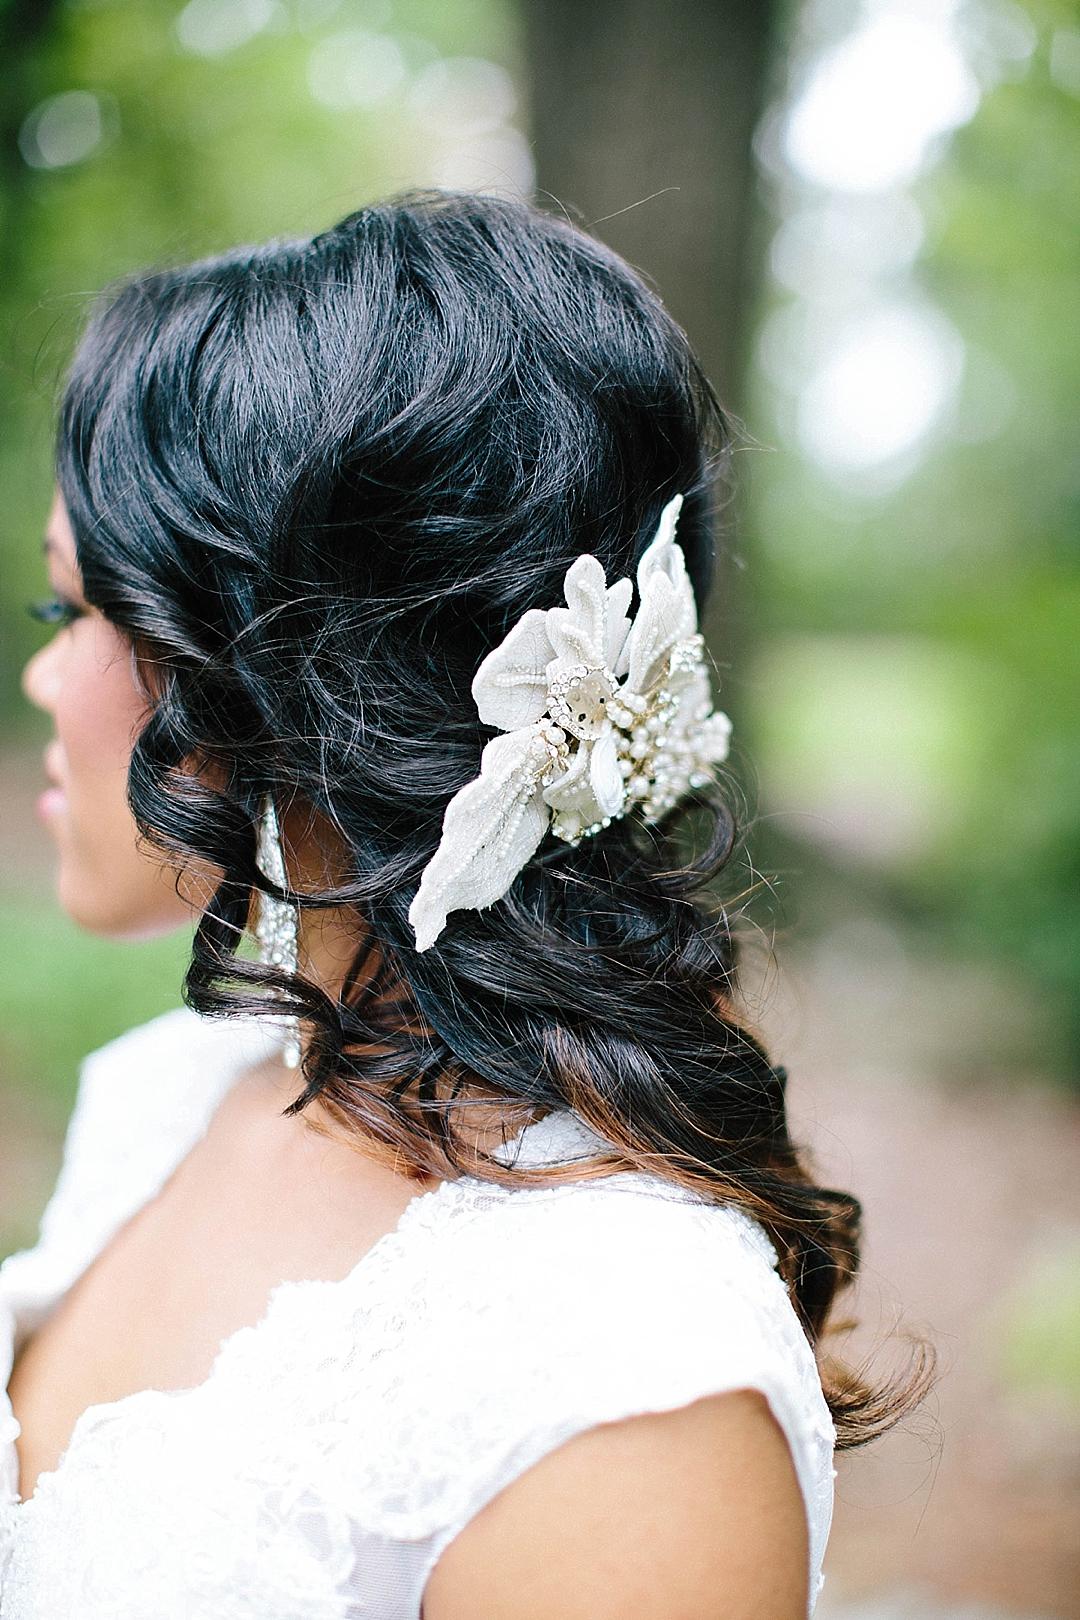 davids bridal for aisle society - hair